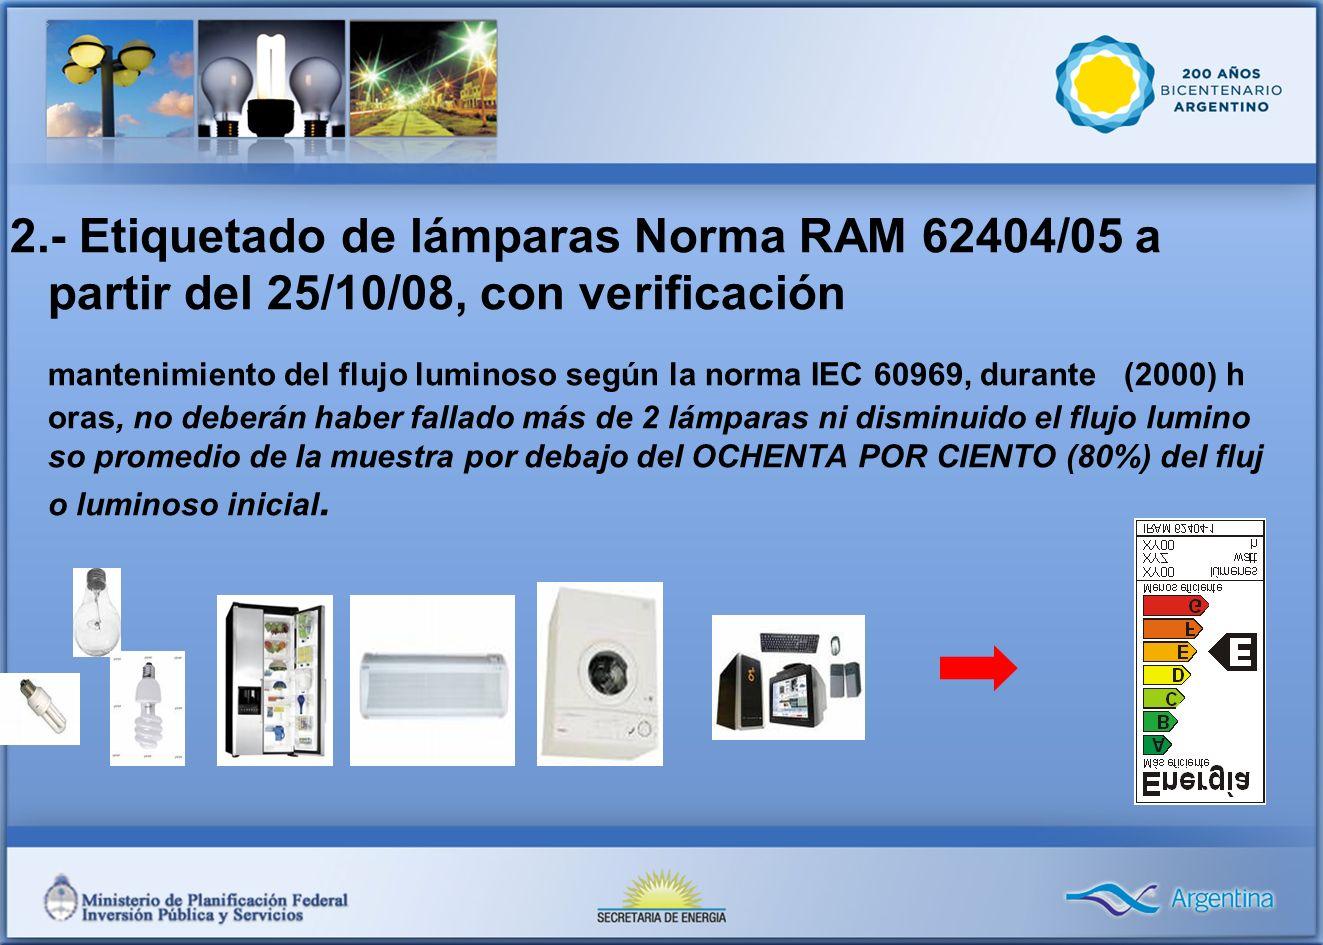 2.- Etiquetado de lámparas Norma RAM 62404/05 a partir del 25/10/08, con verificación